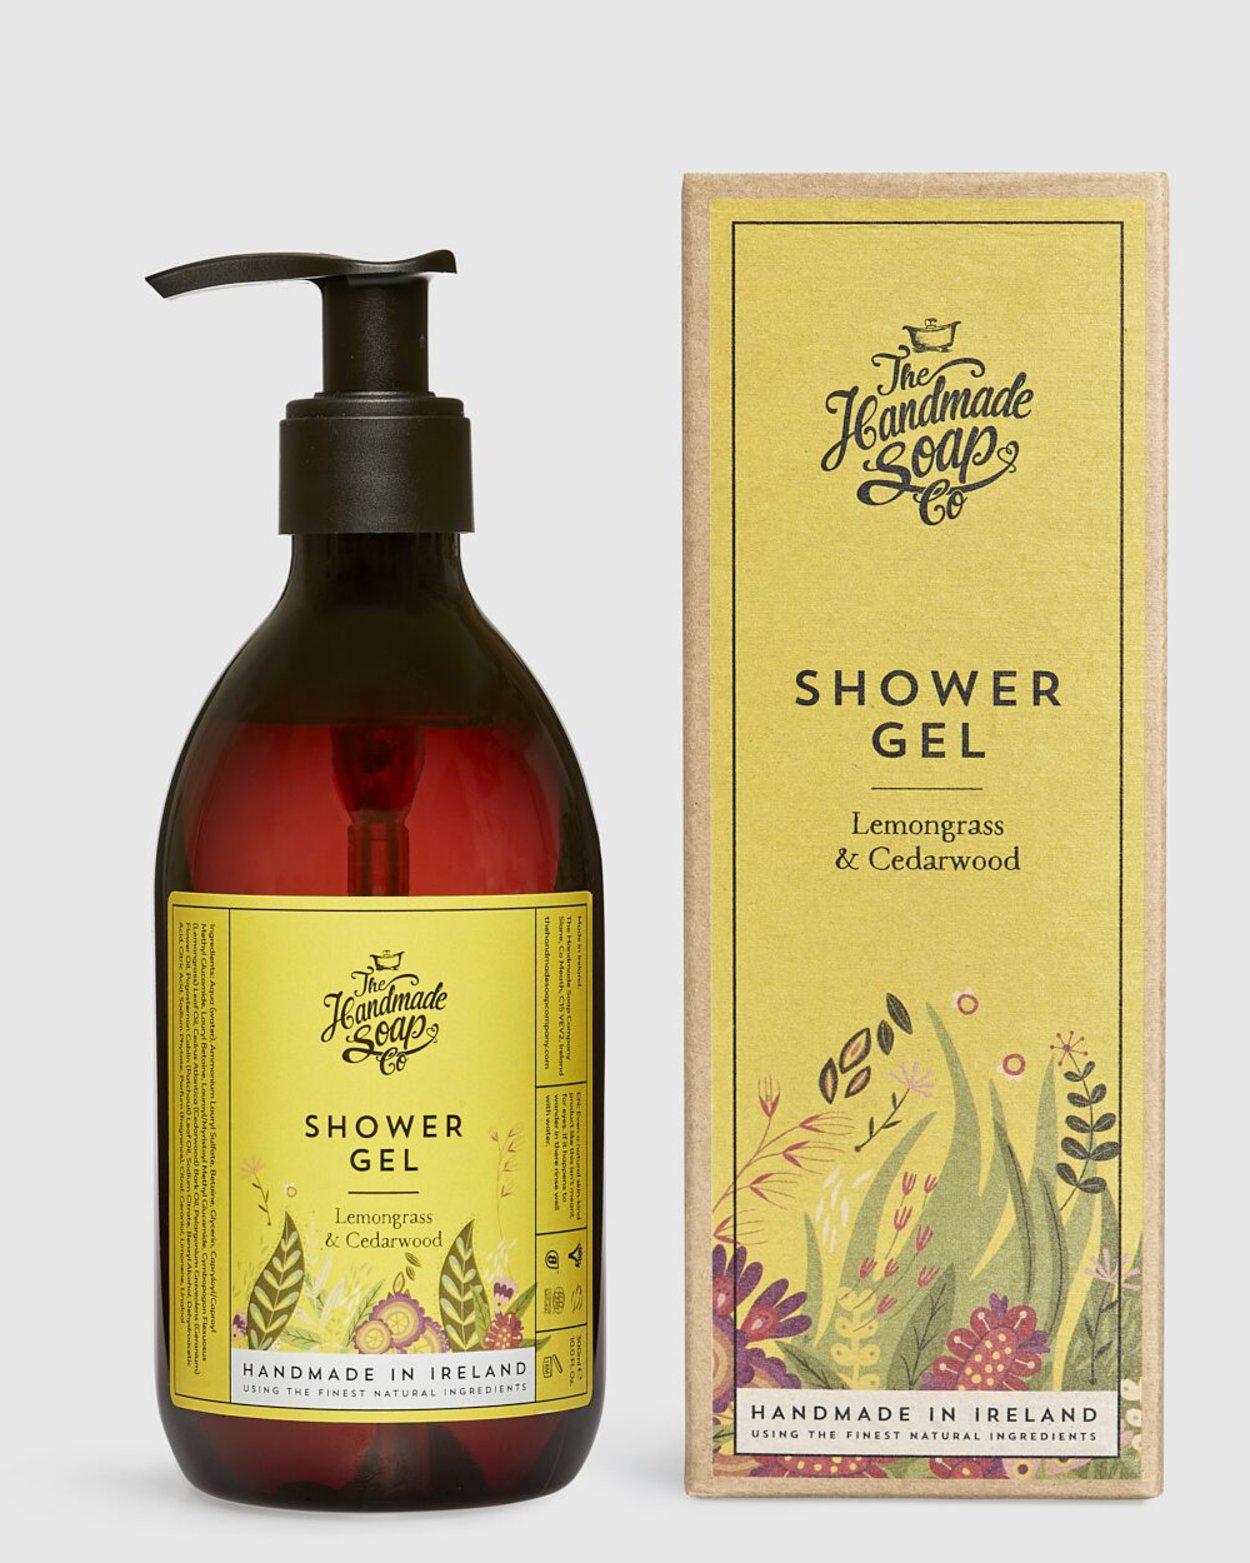 Lemongrass & Cedarwood Shower Gel